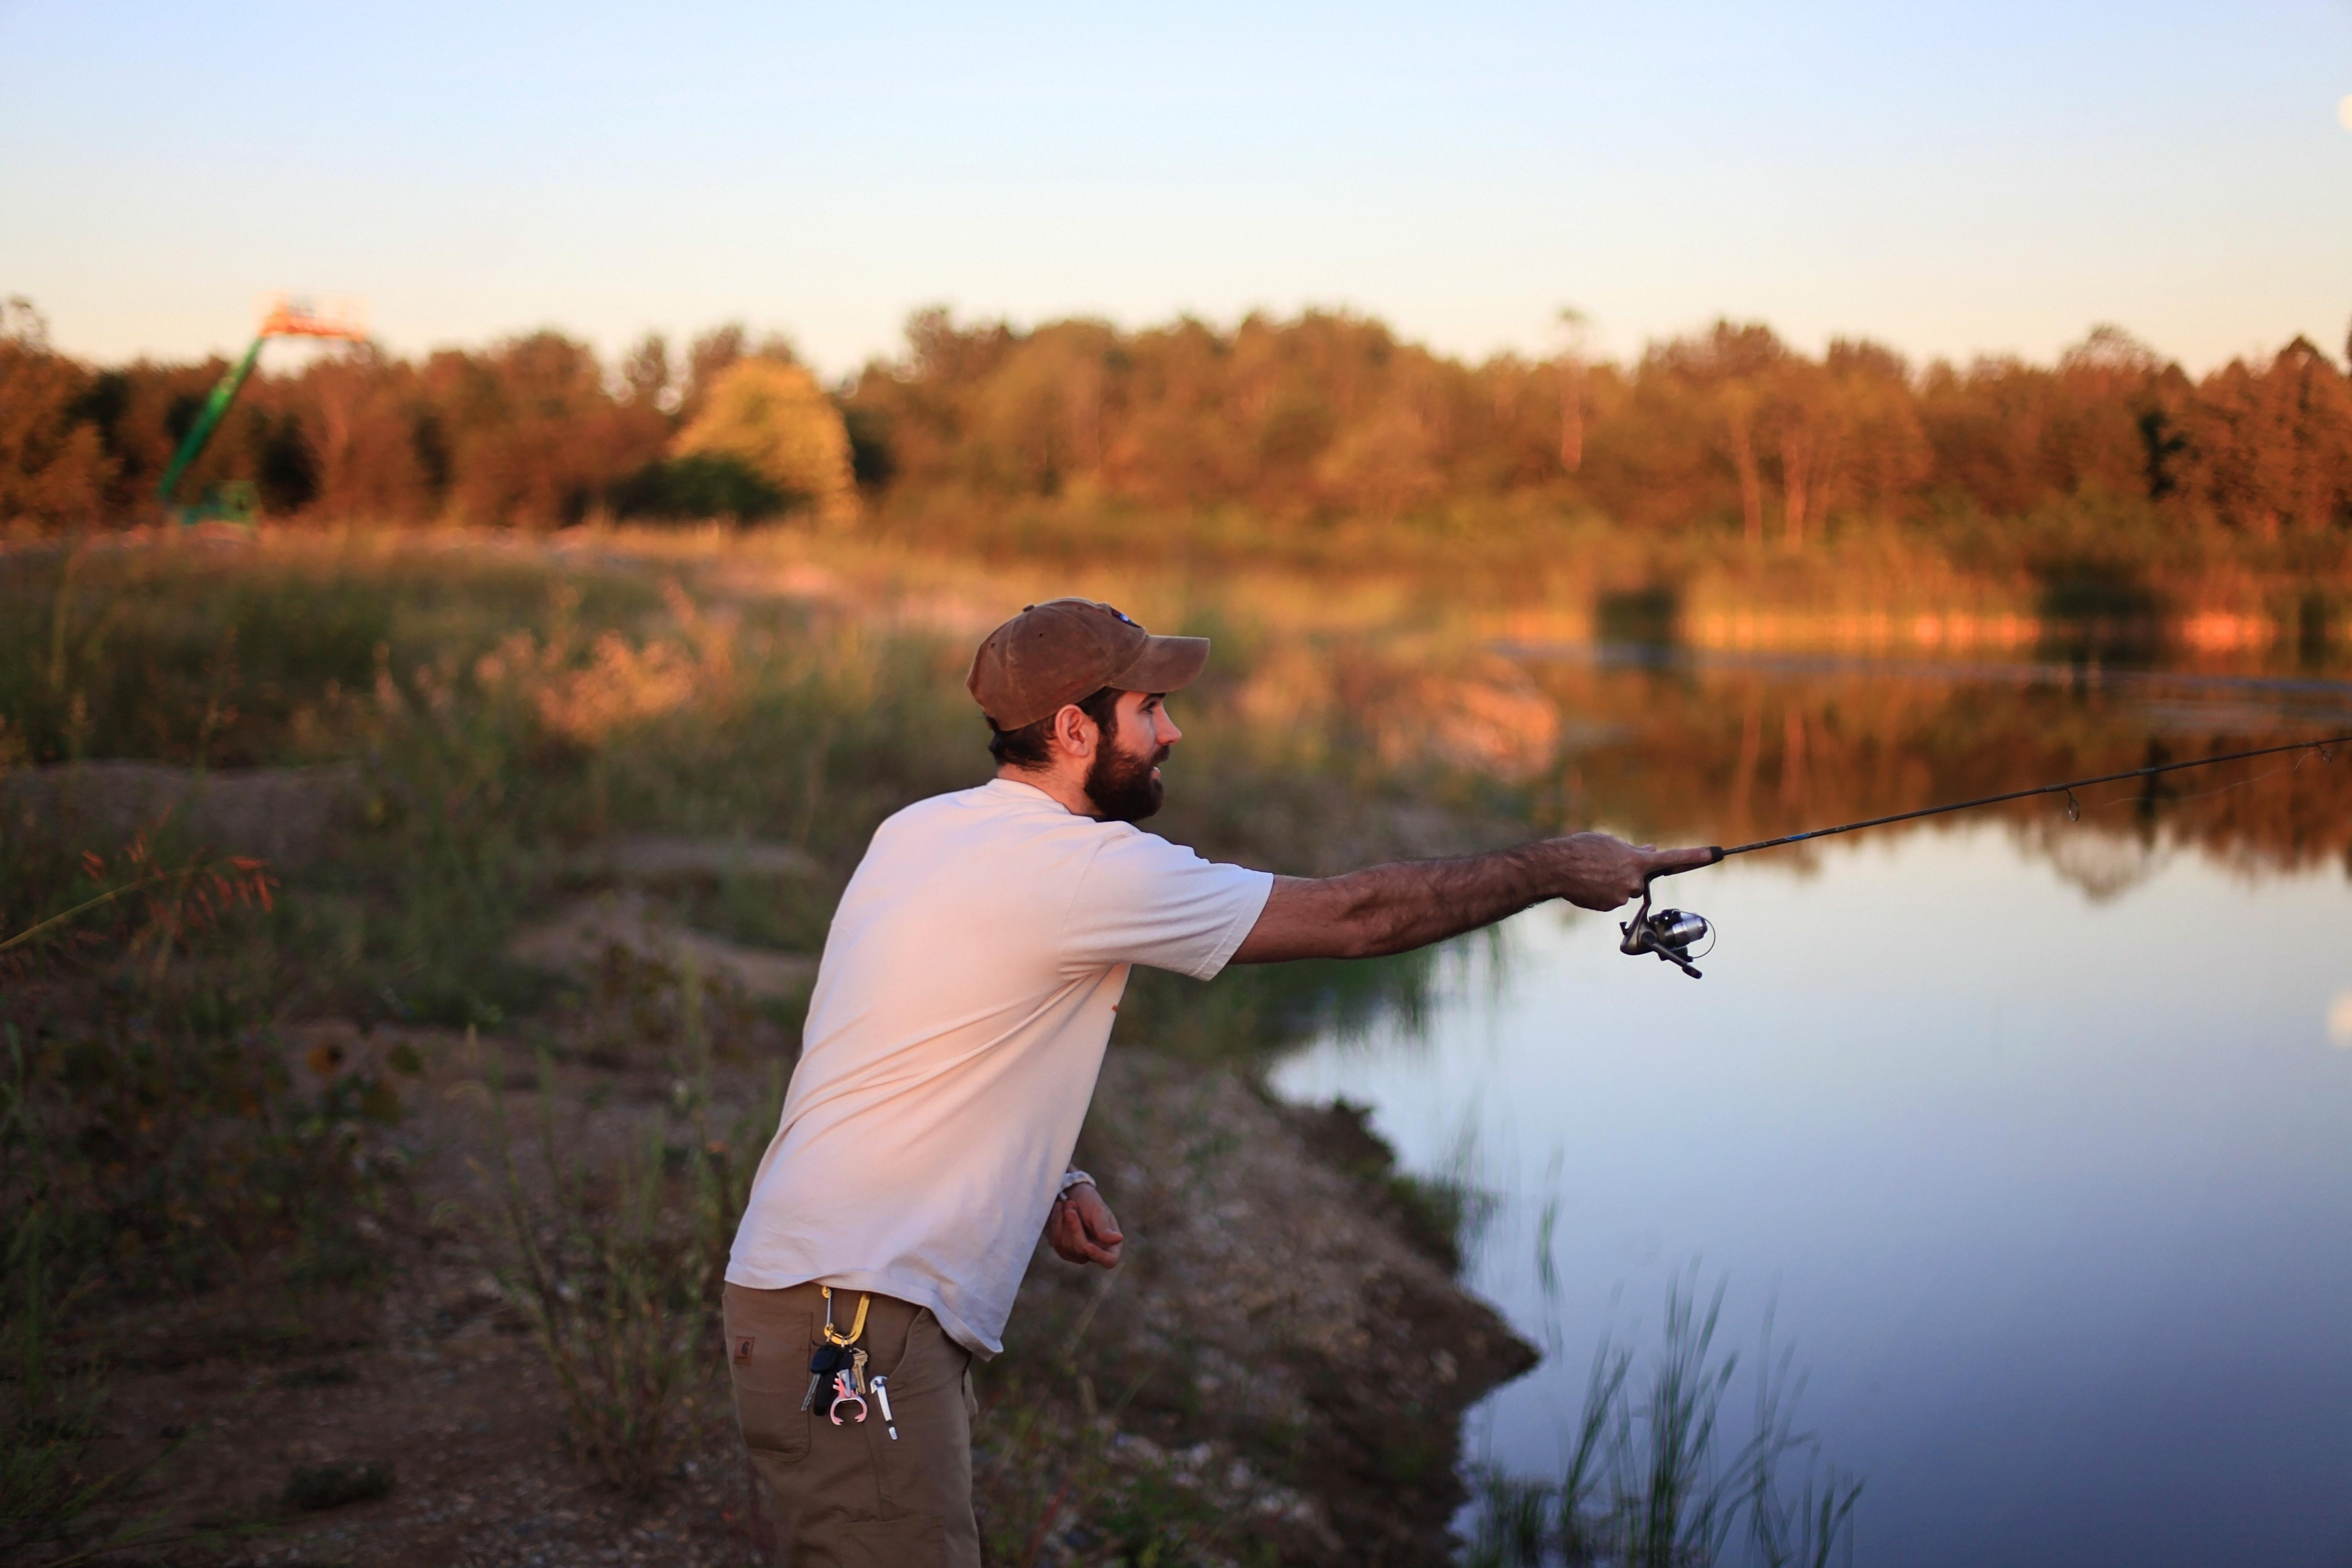 Рыбак забрасывает удочку осенью